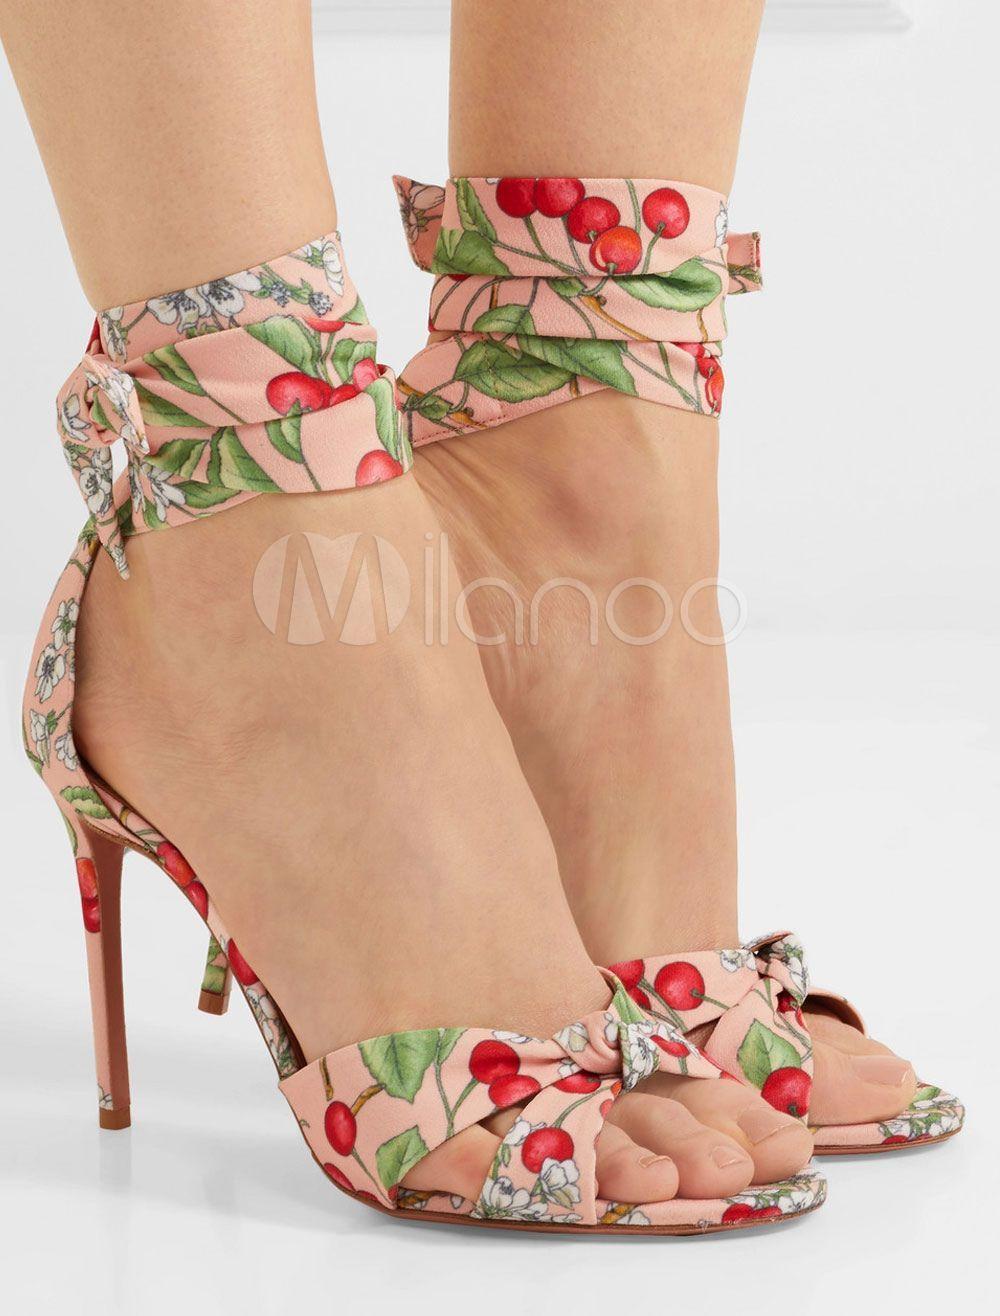 c2c216495363 High Heel Sandals Plus Size Flesh Open Toe Cherry Printed Ankle Strap  Sandals Lace Up Sandal Shoes